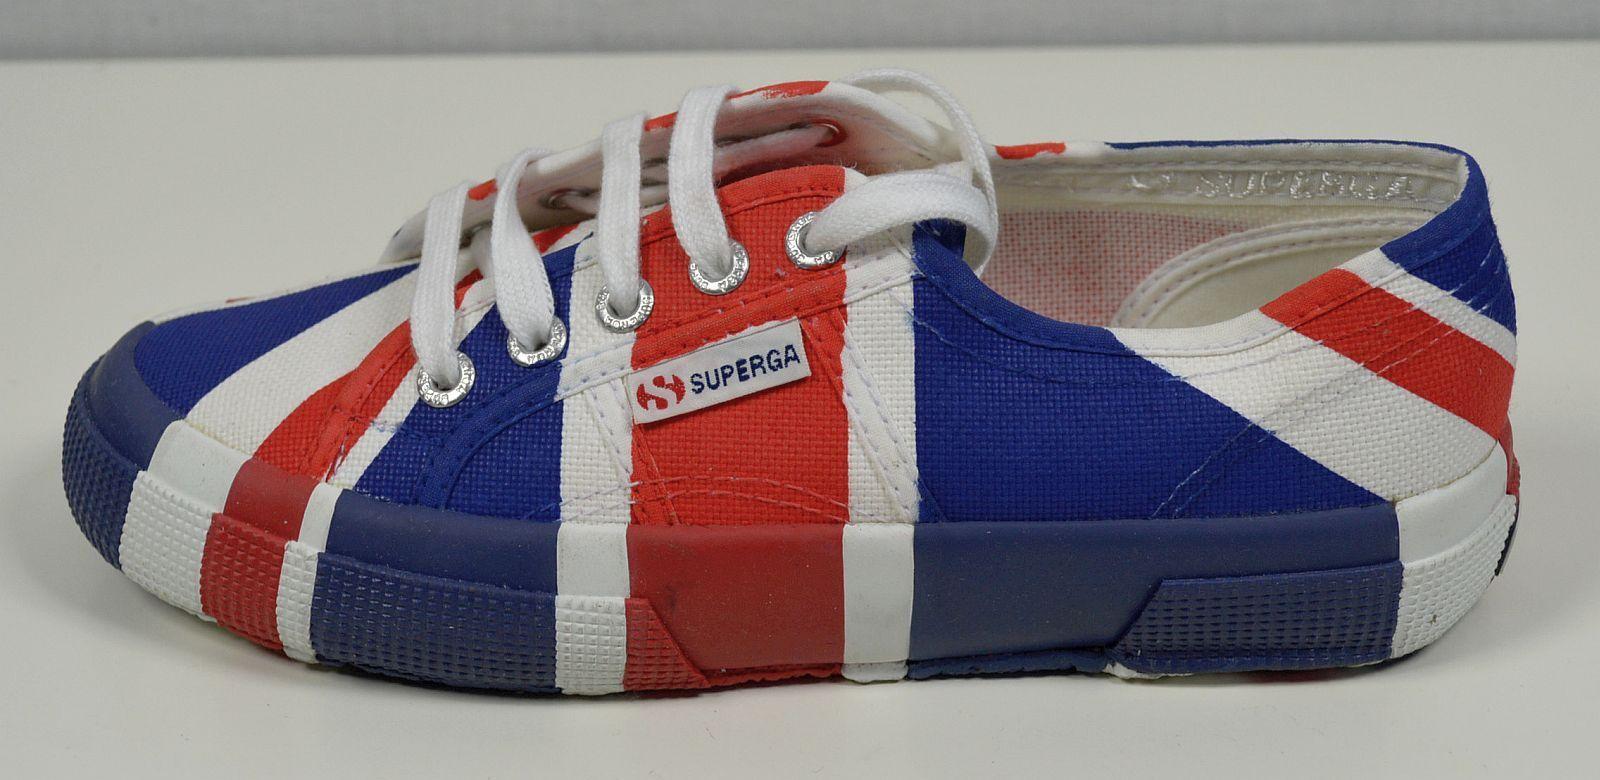 SUPERGA 2750 Cotu Flag United Kingdom Unisex Sneaker EUR 37 schuhe 30121600